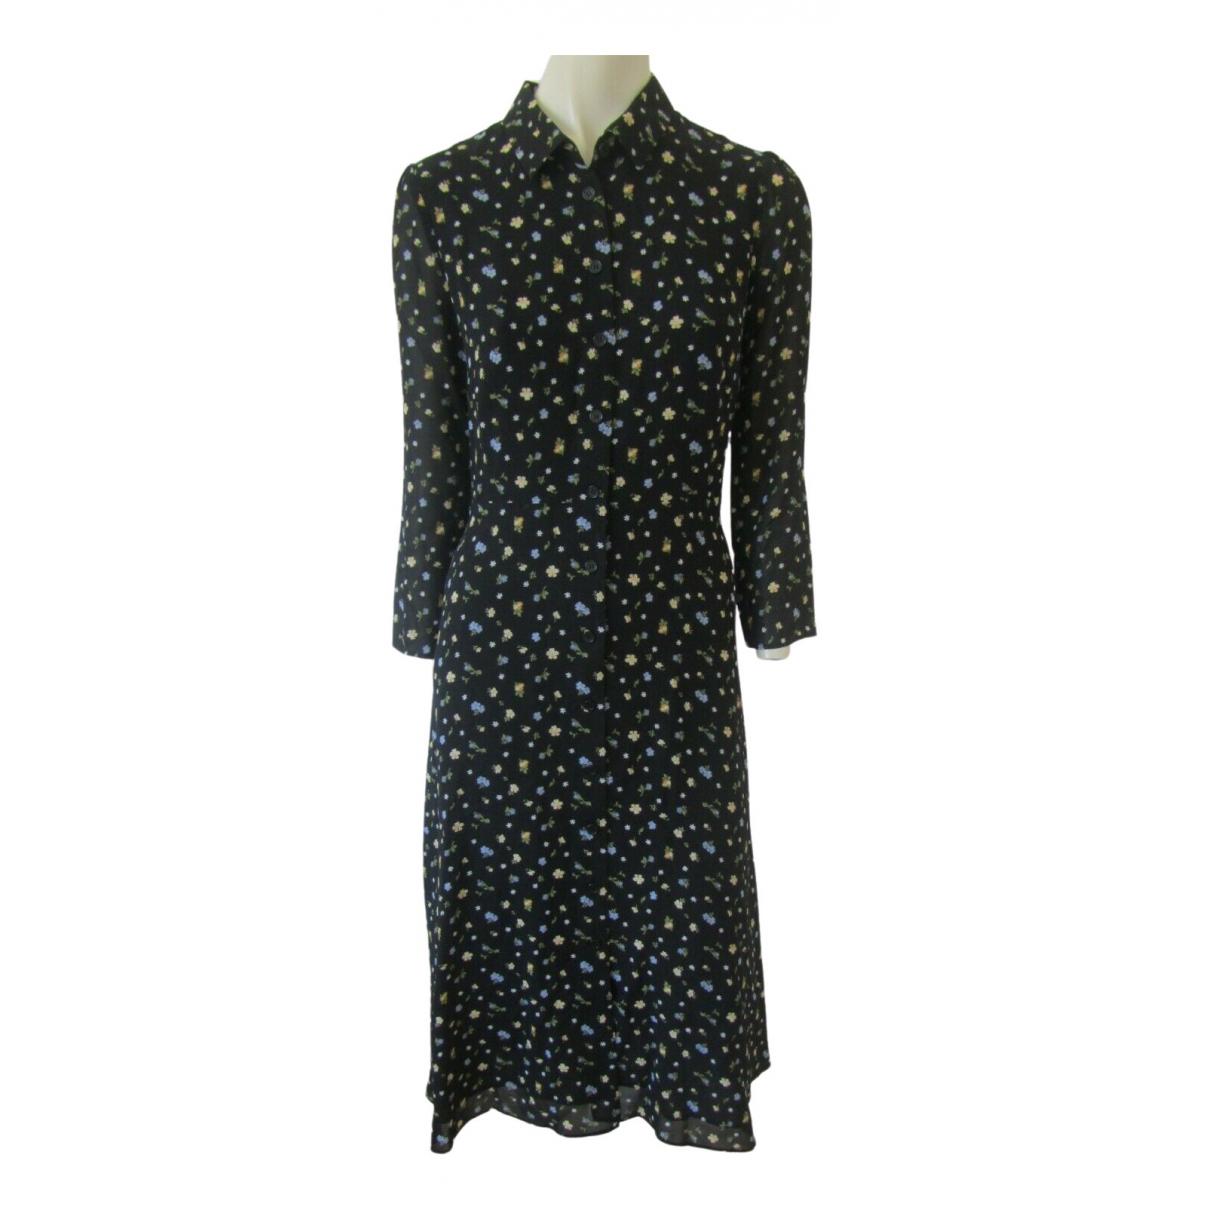 Reformation \N Multicolour dress for Women 4 US